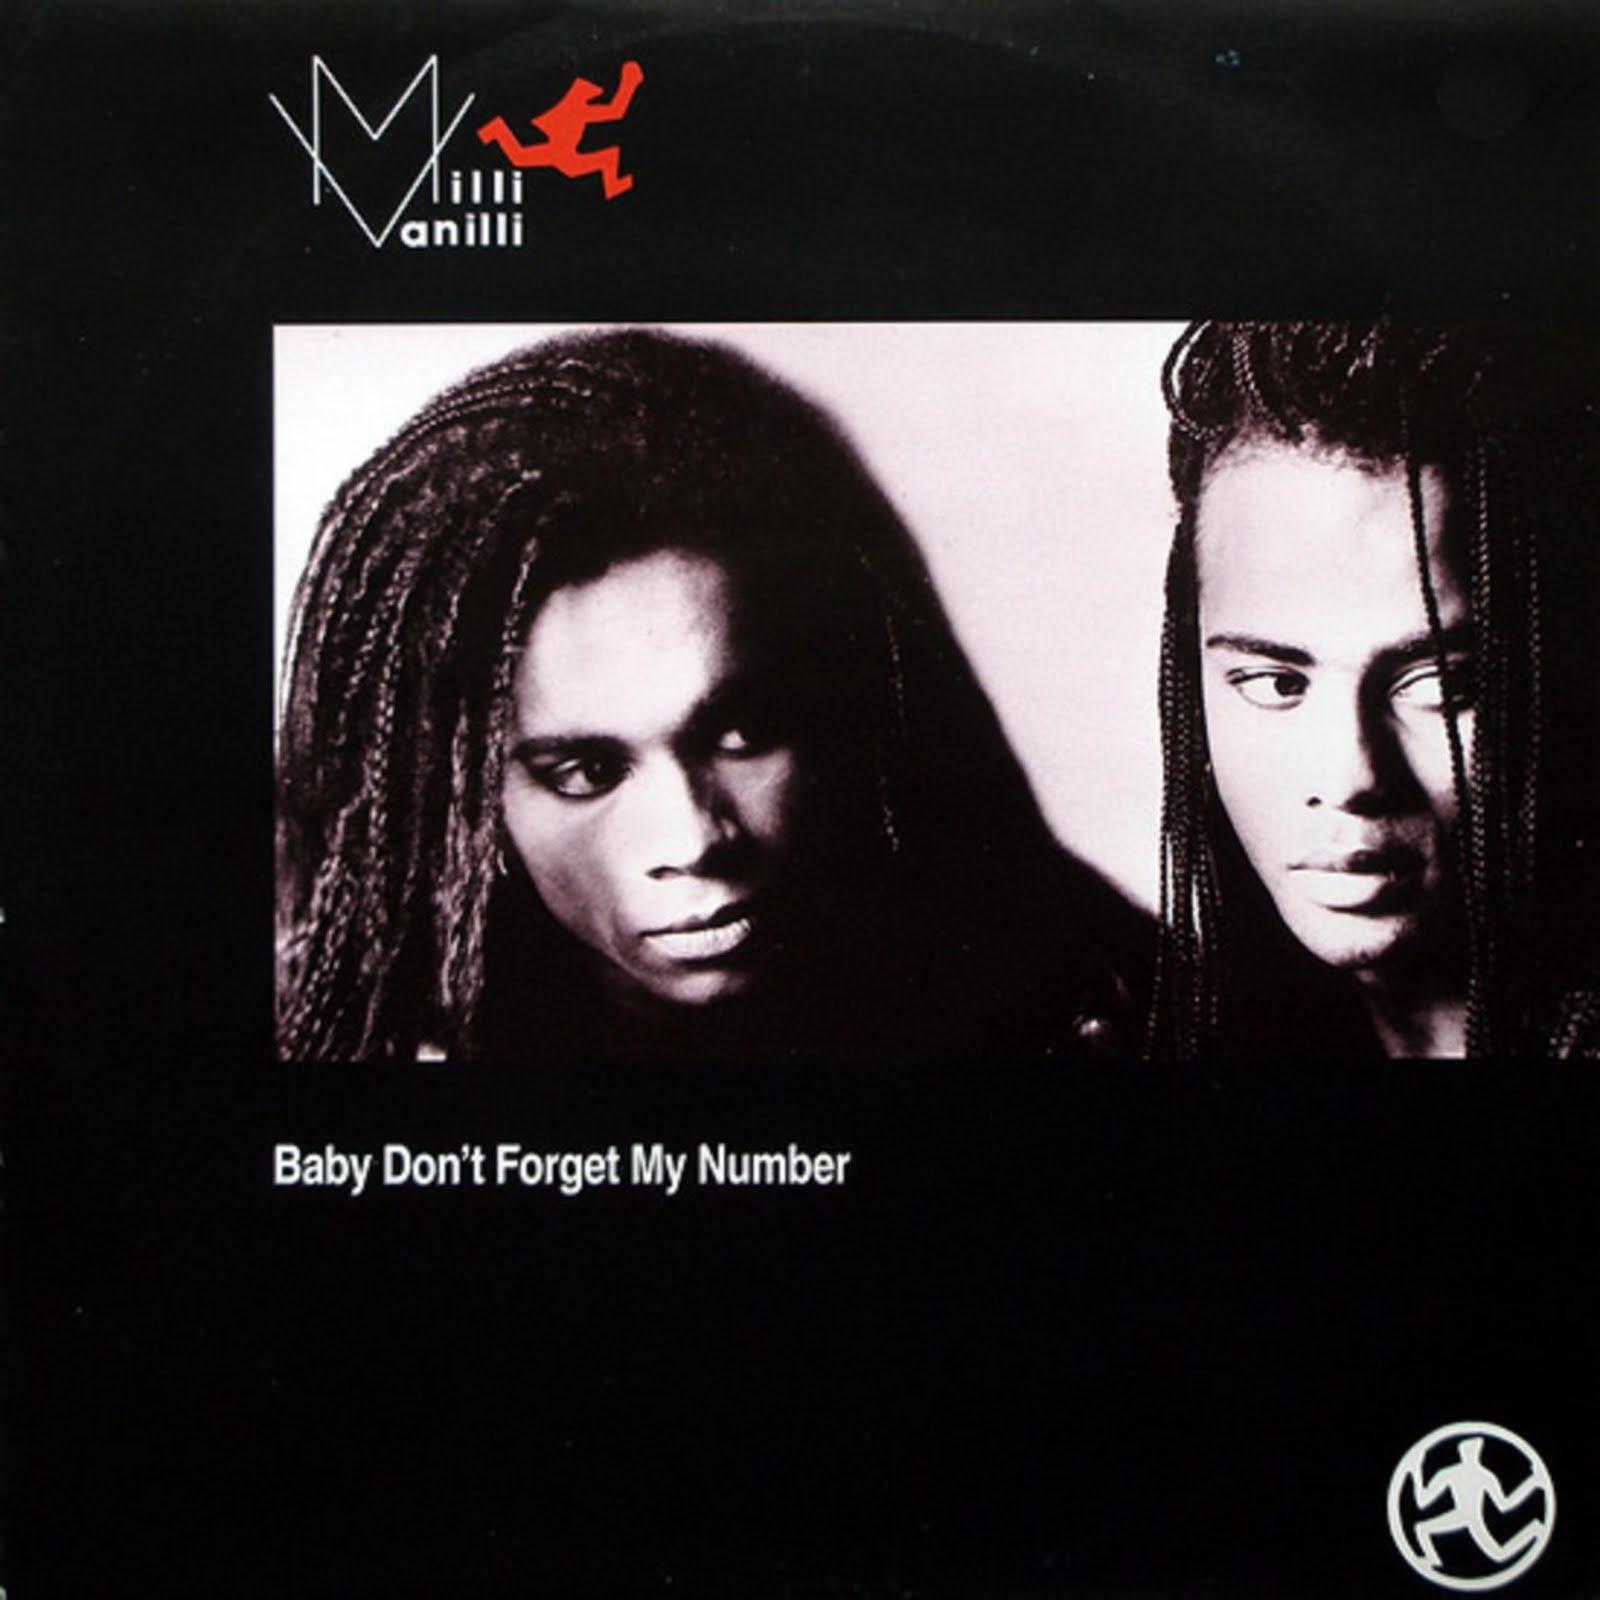 CHANNEL MUSIC COLLECTION ON VINYL: MILLI VANILLI - BABY ...